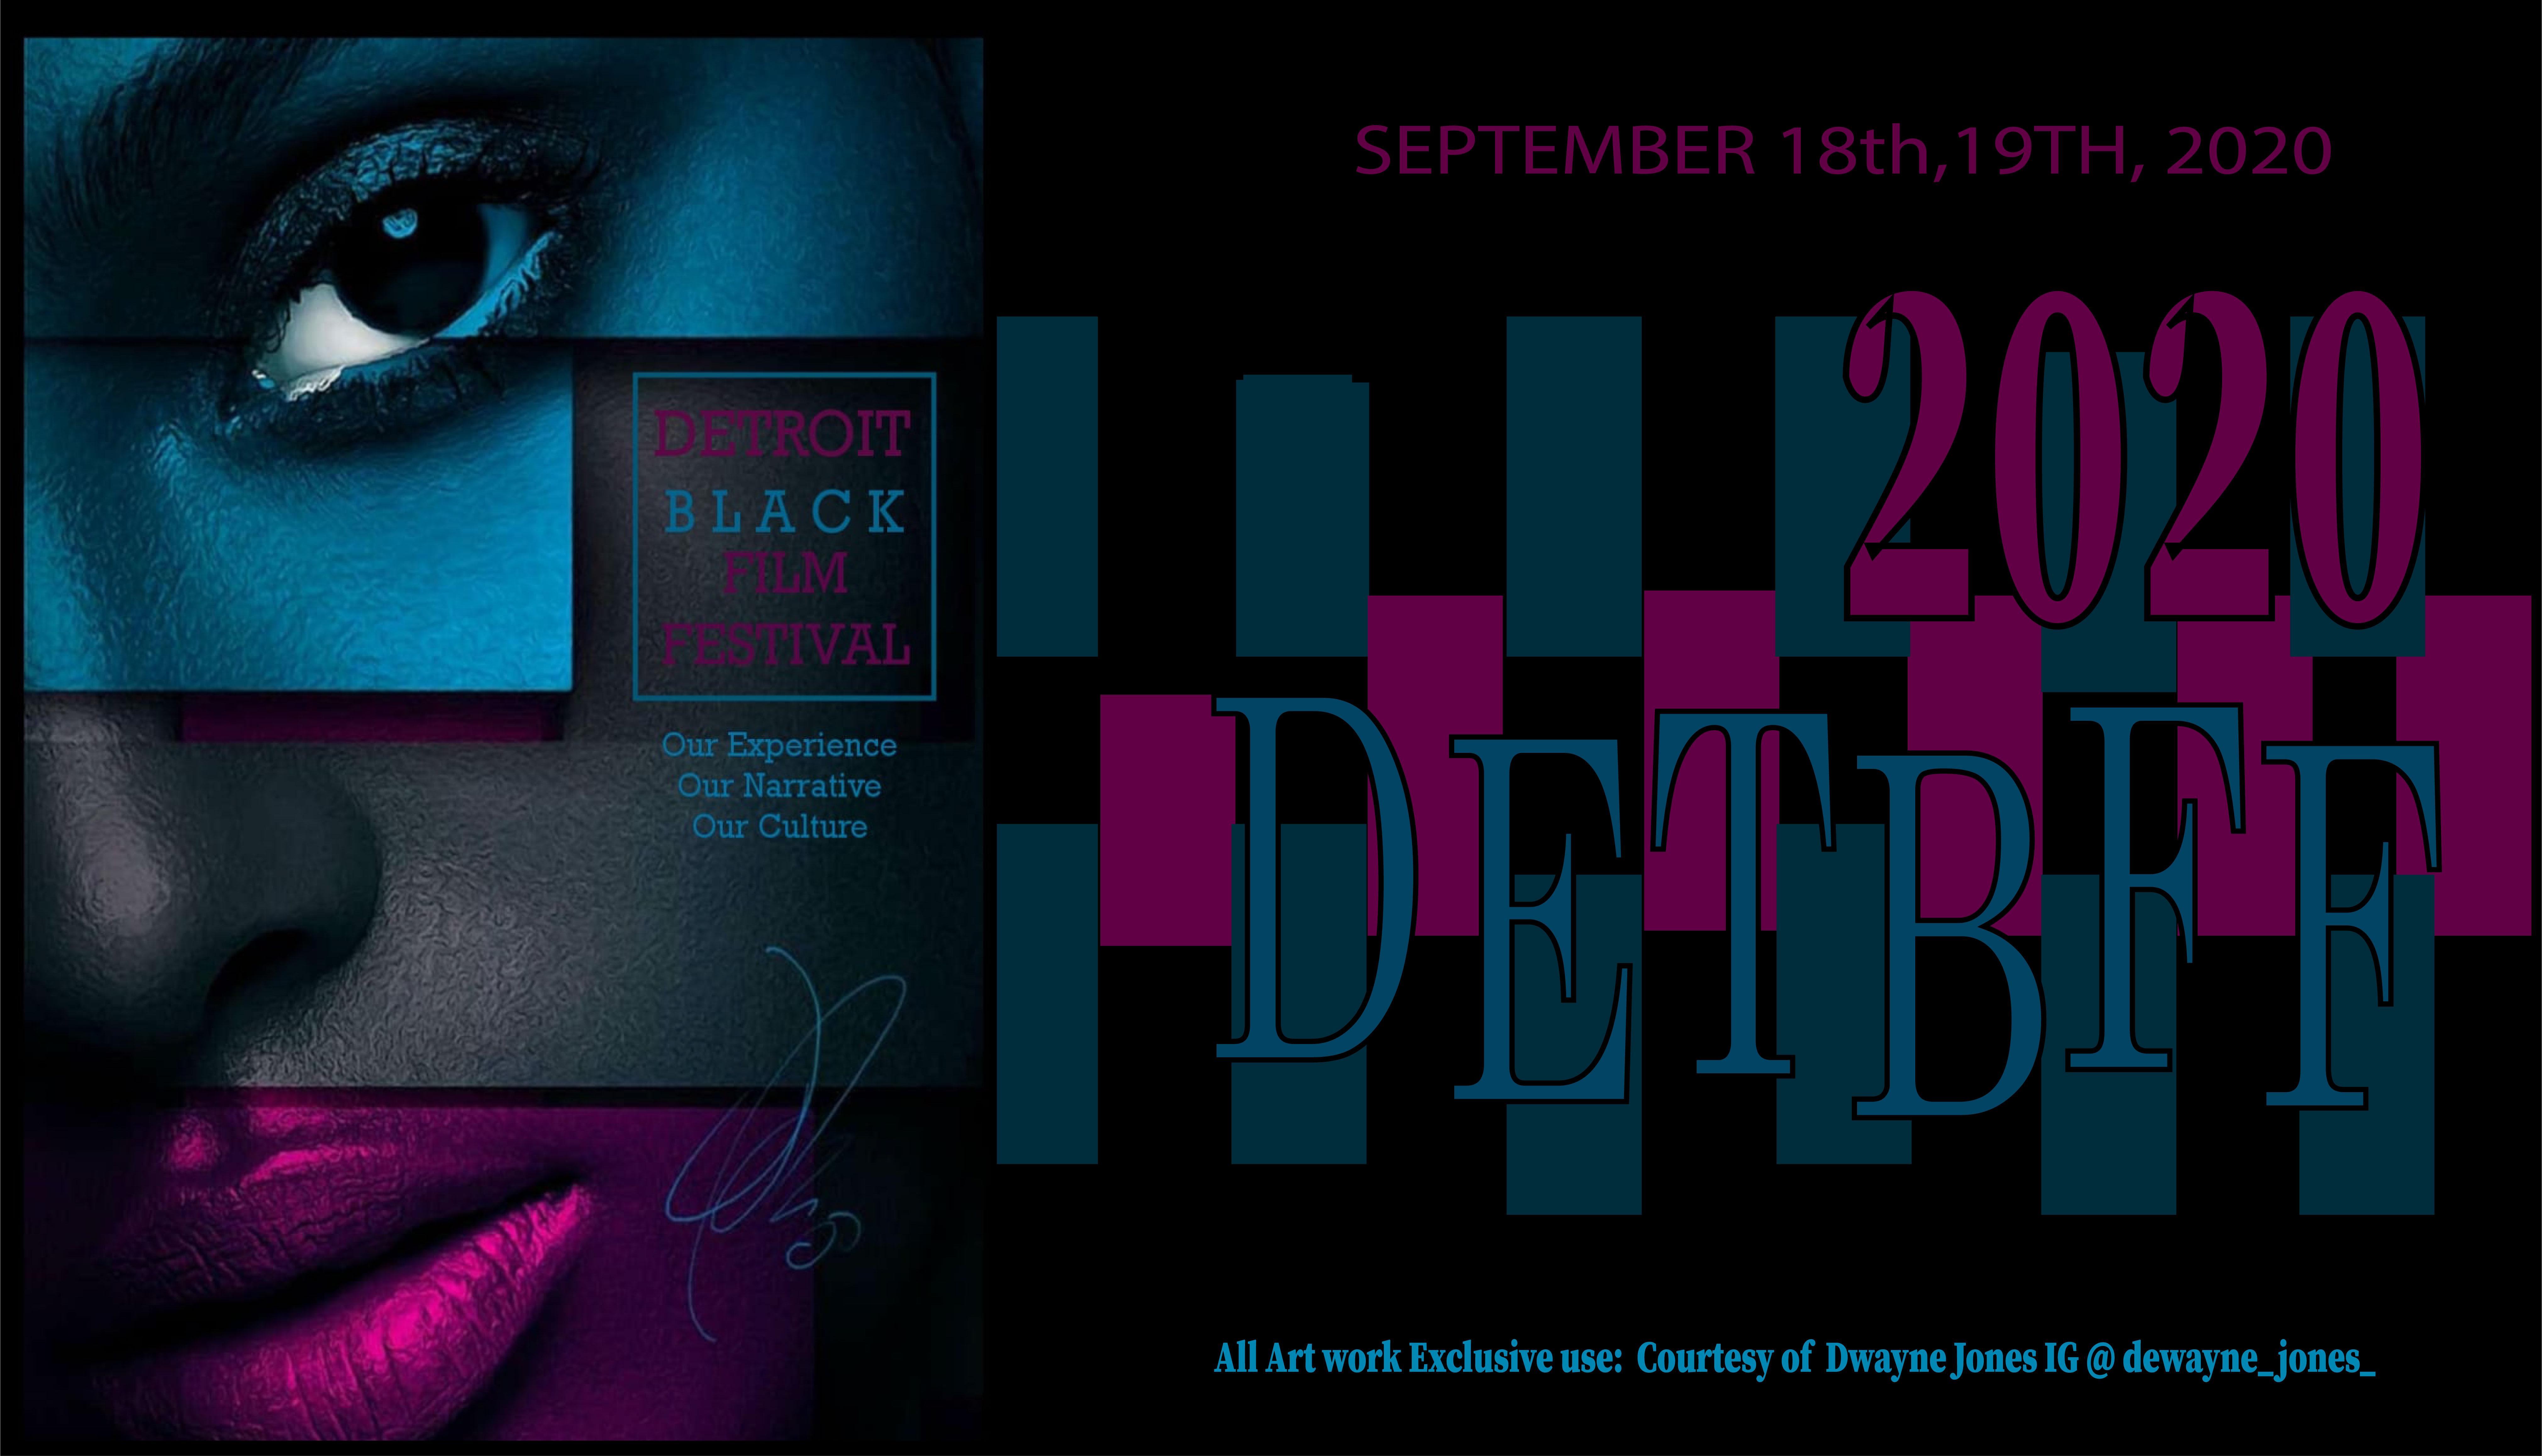 DETROIT BLACK FILM FESTIVAL (The Inaugural)